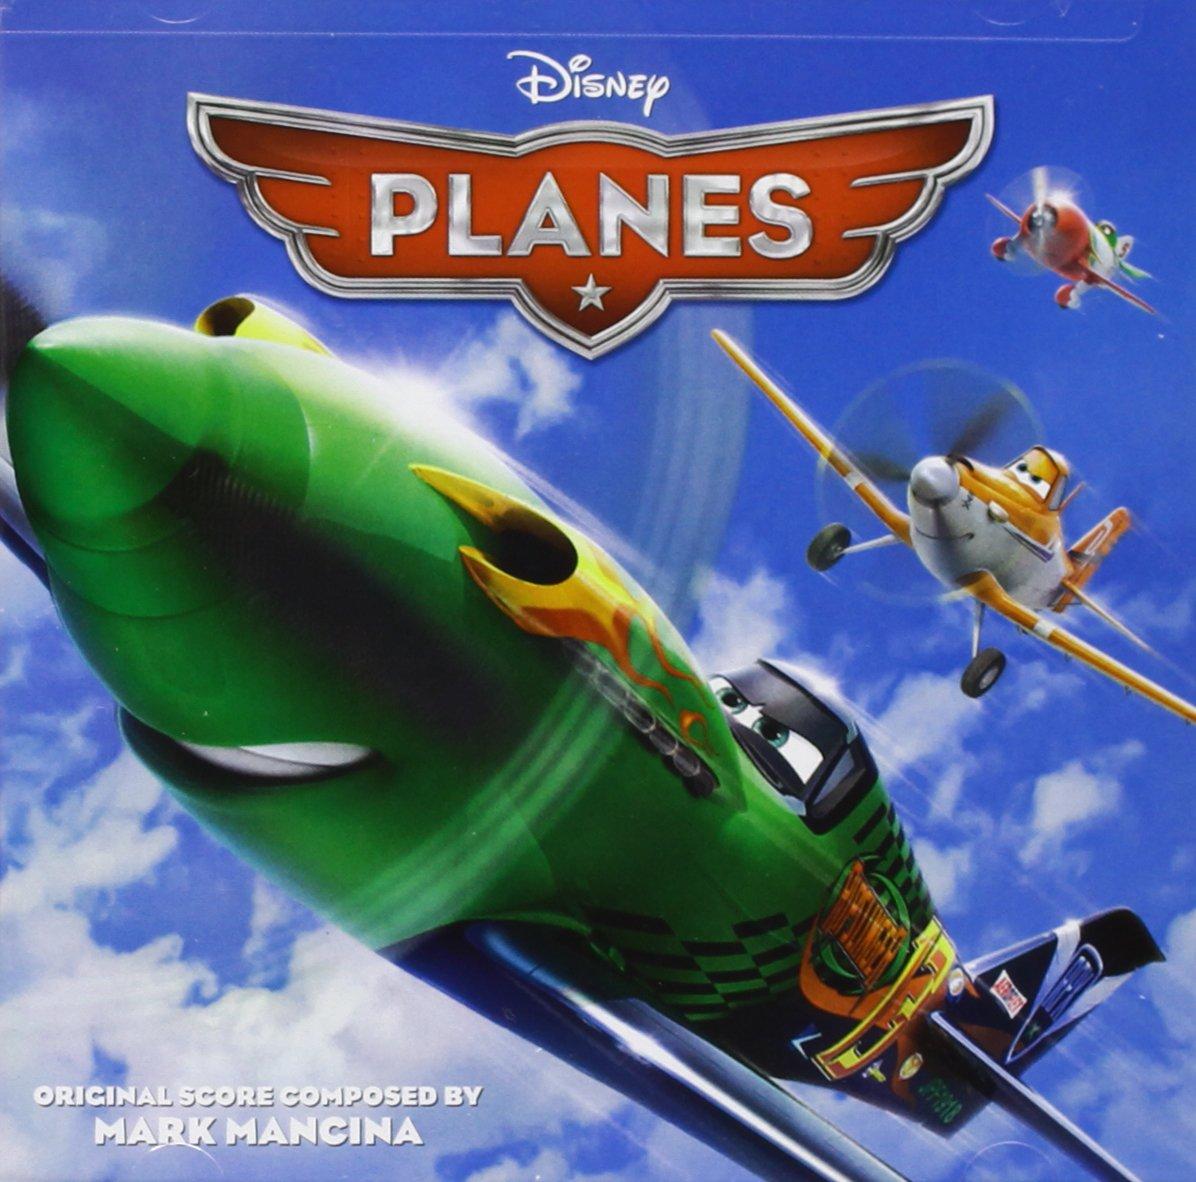 Planes (Mark Mancina) by Walt Disney Records